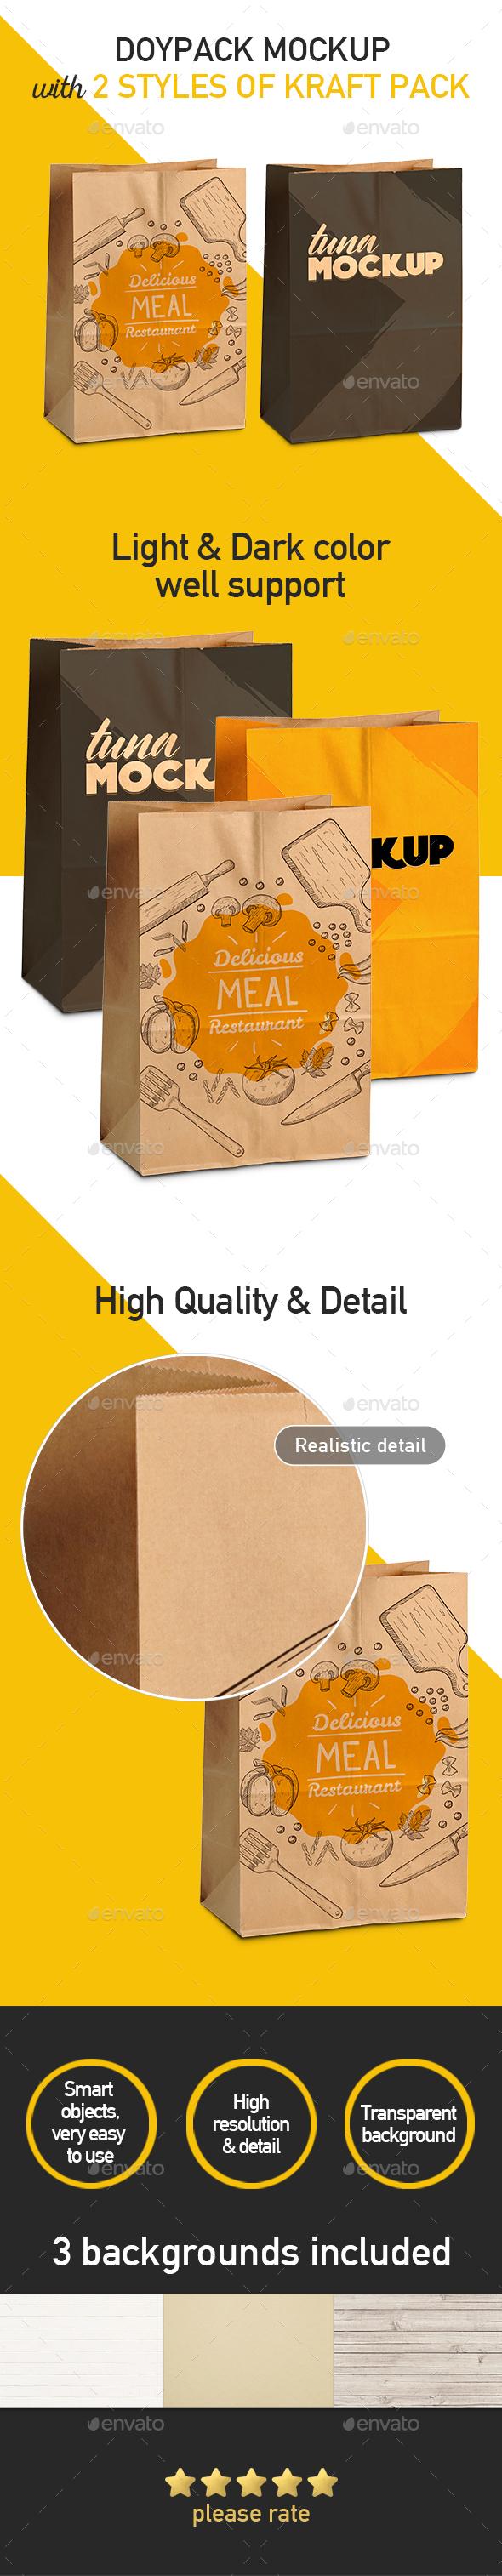 Kraft Paper Bag Mockup - Product Mock-Ups Graphics